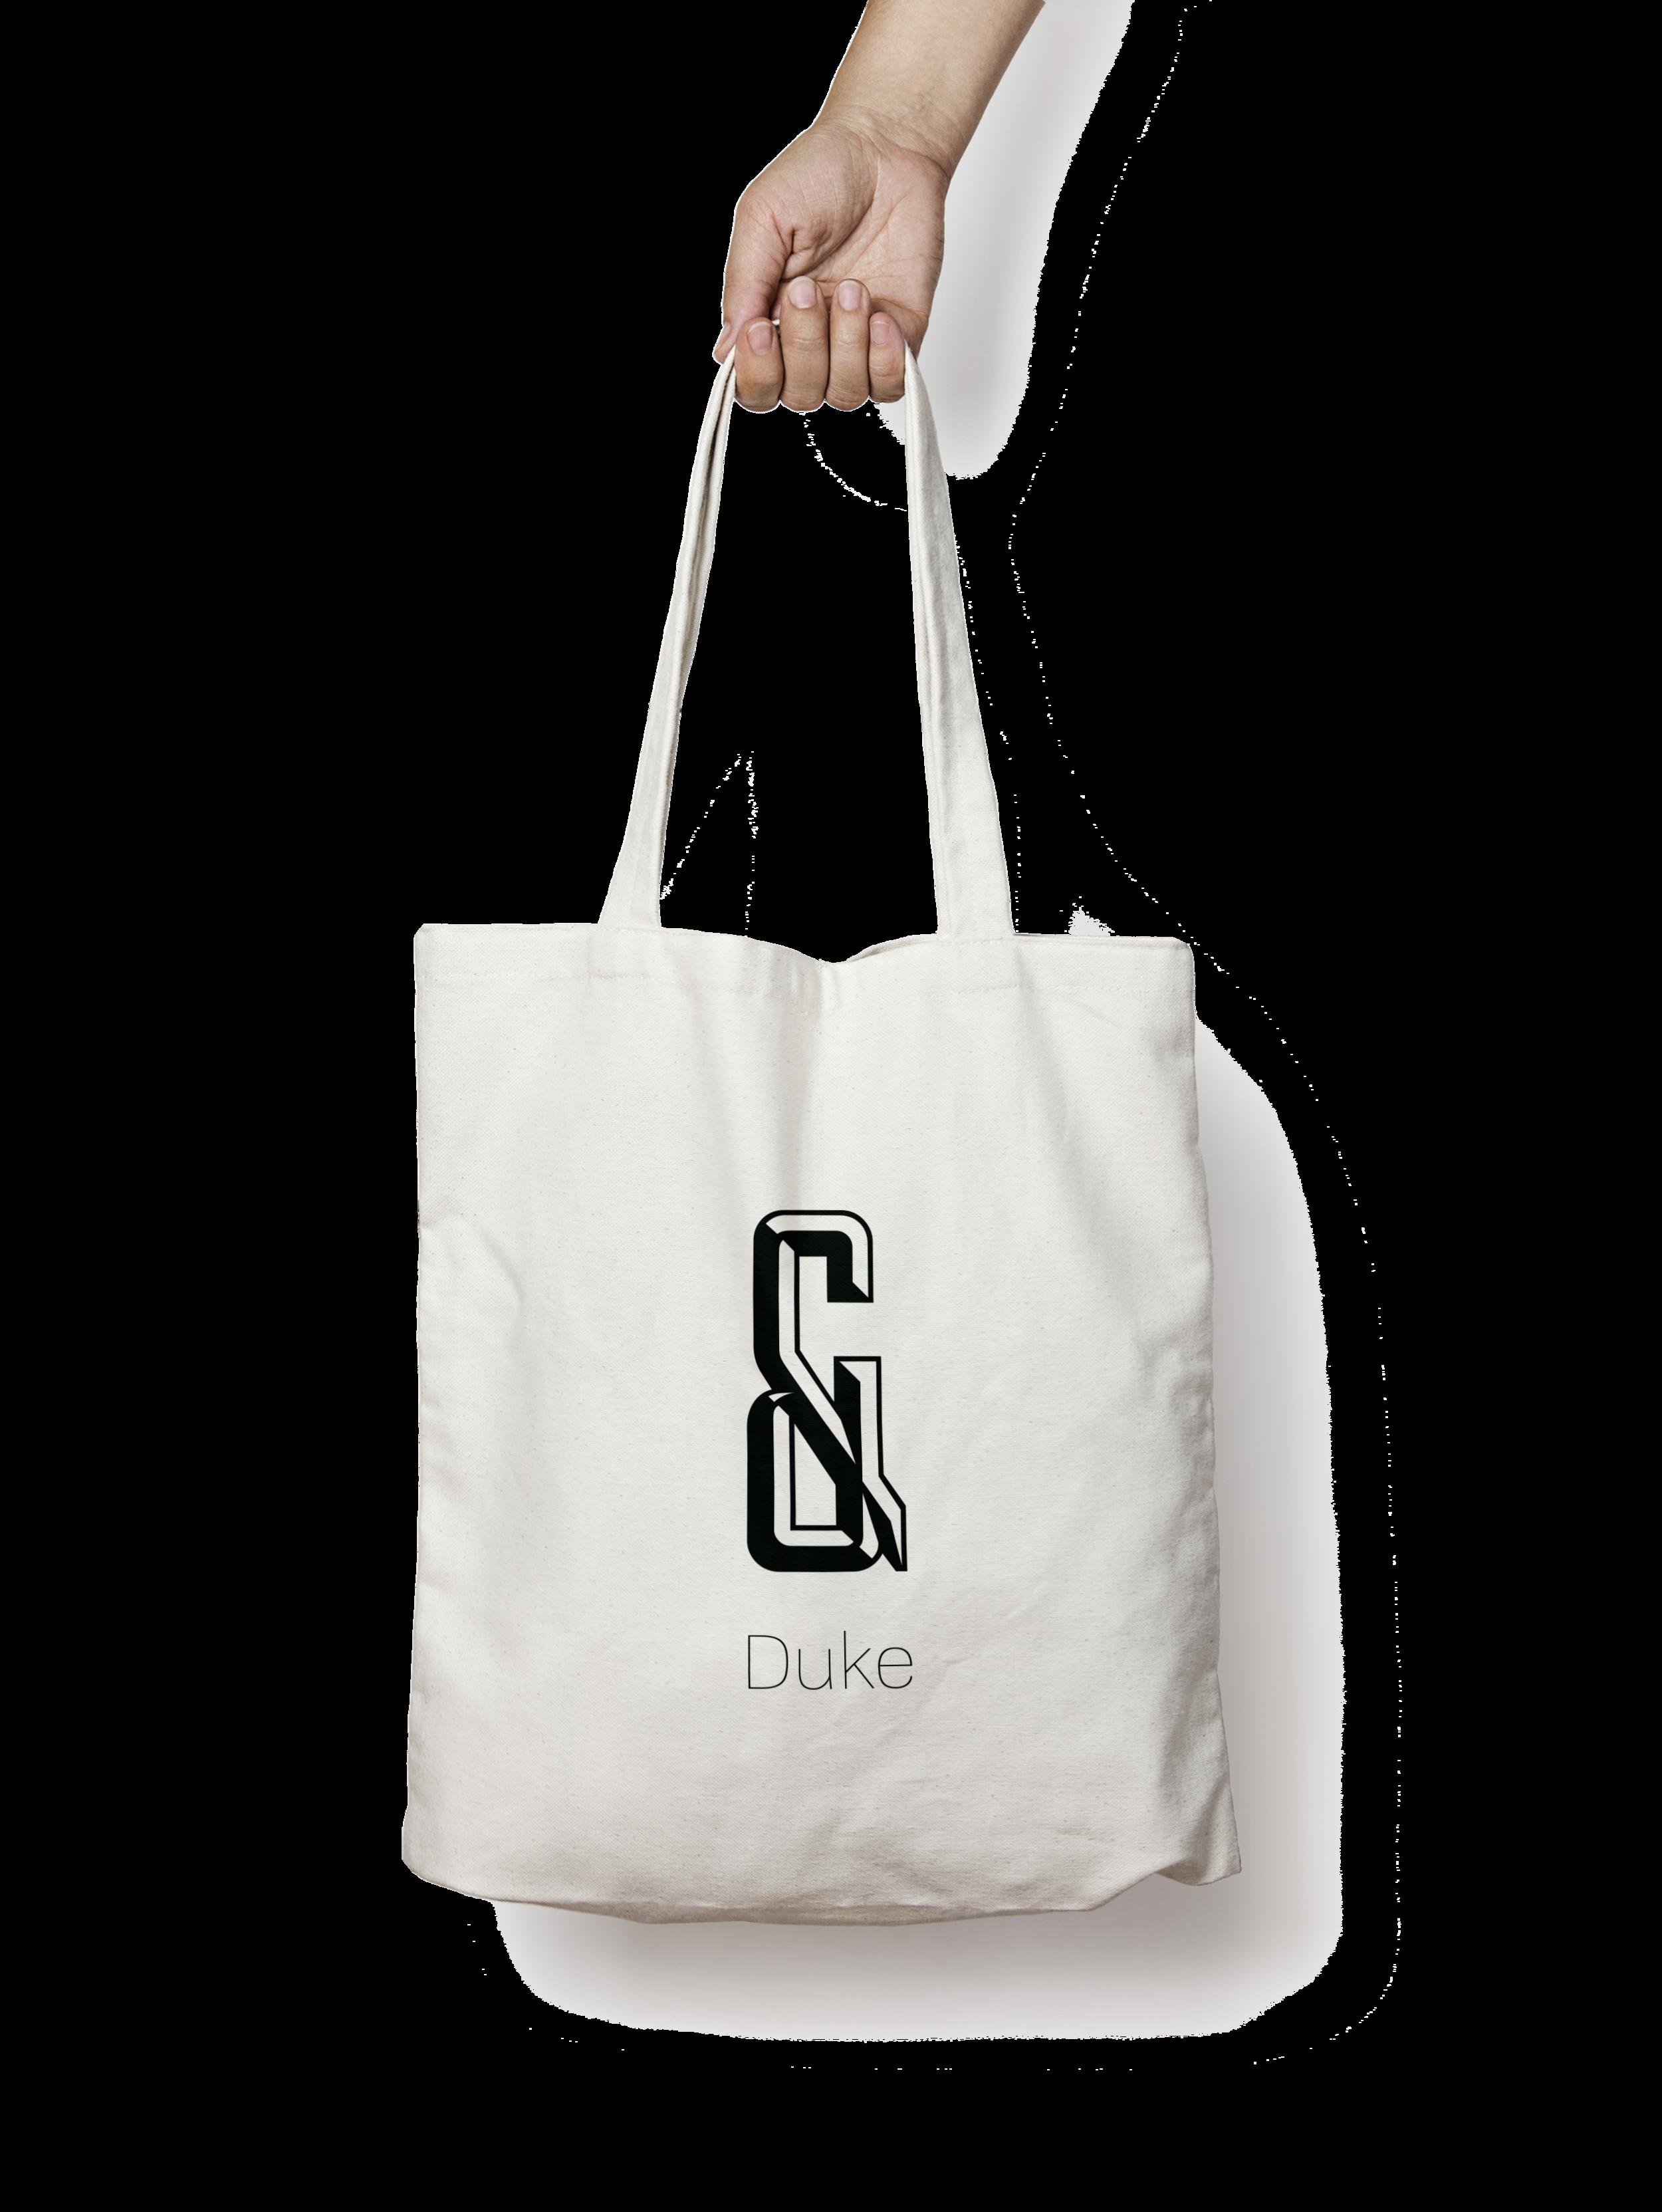 ampersand canvas bag.png